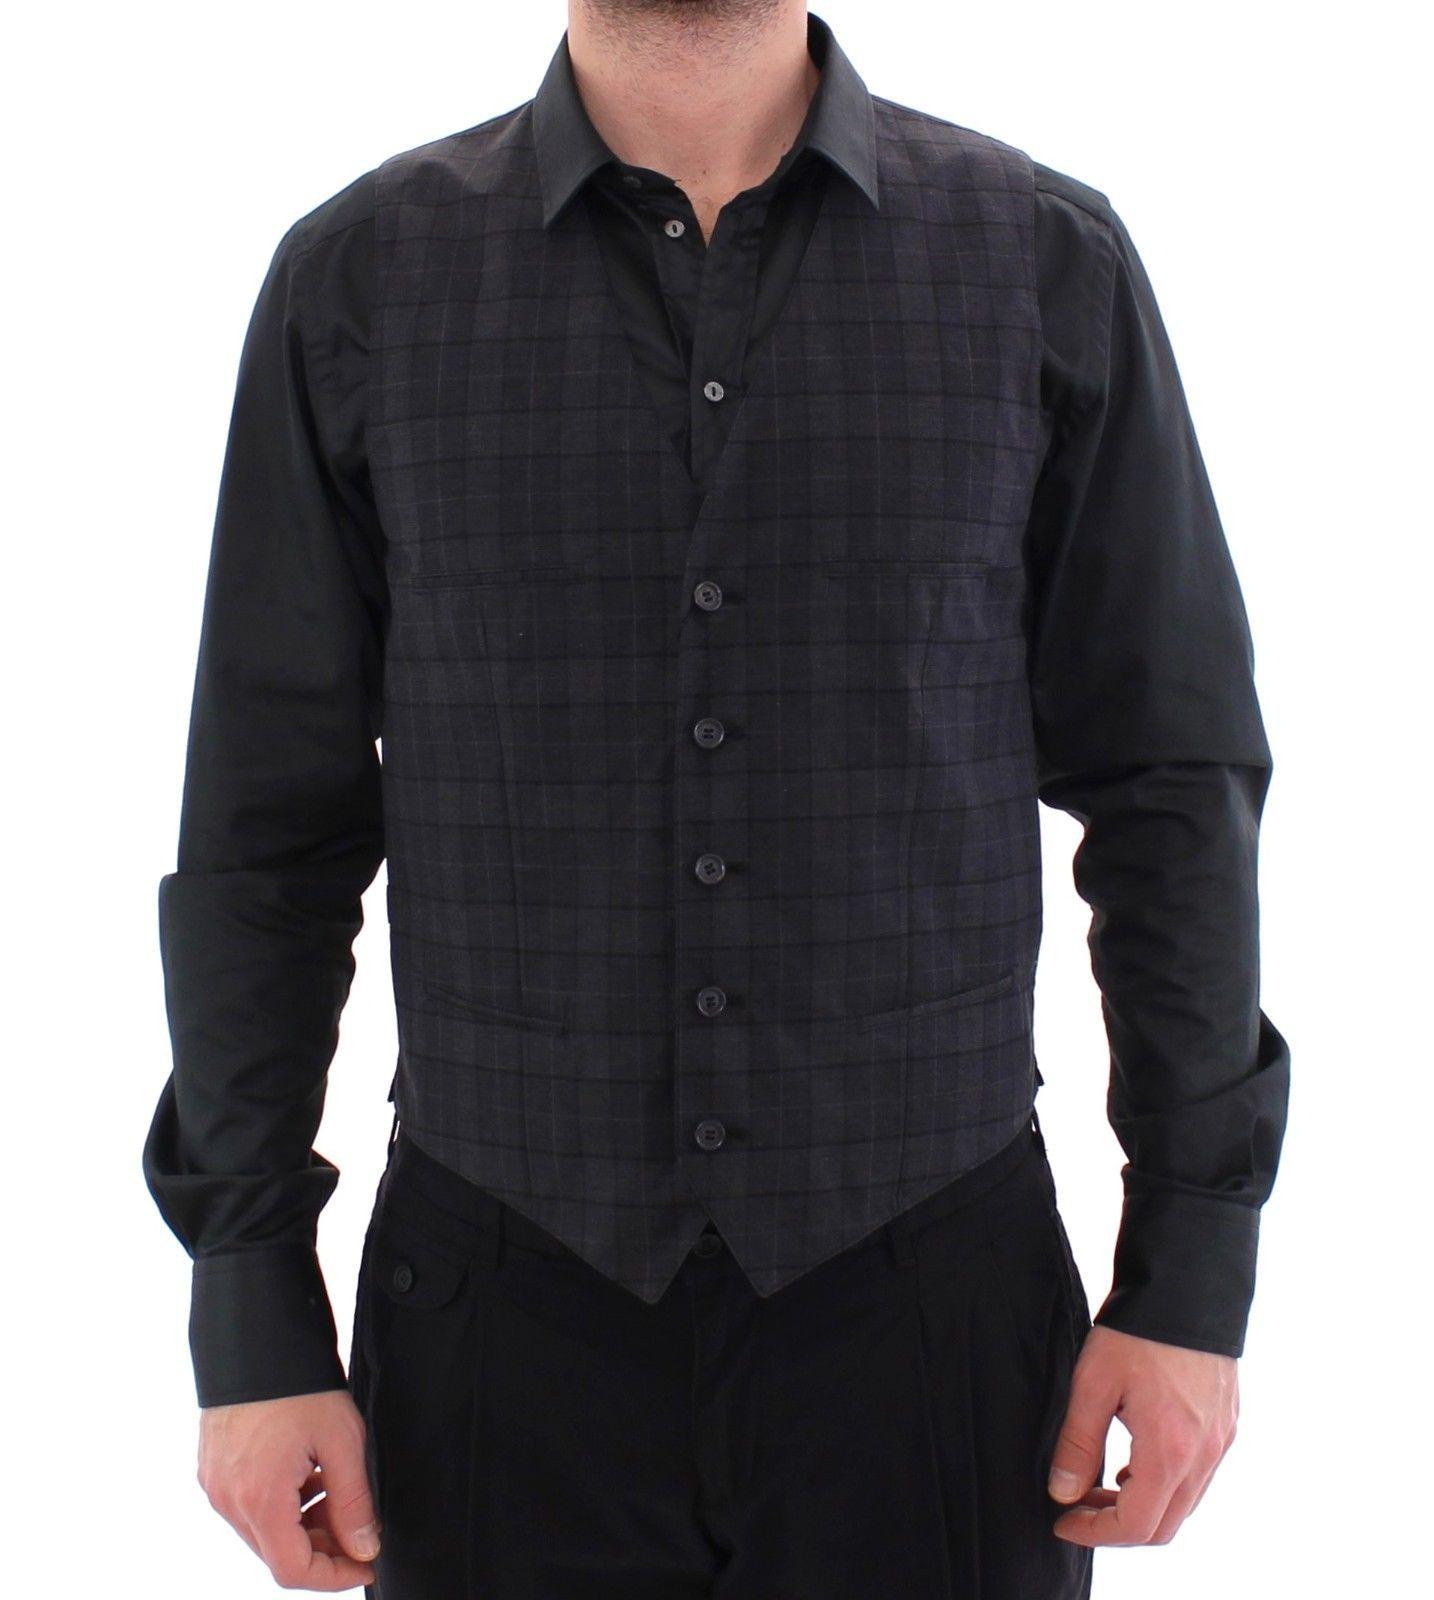 Dolce & Gabbana Gray Checkered Formal Dress Vest Gilet